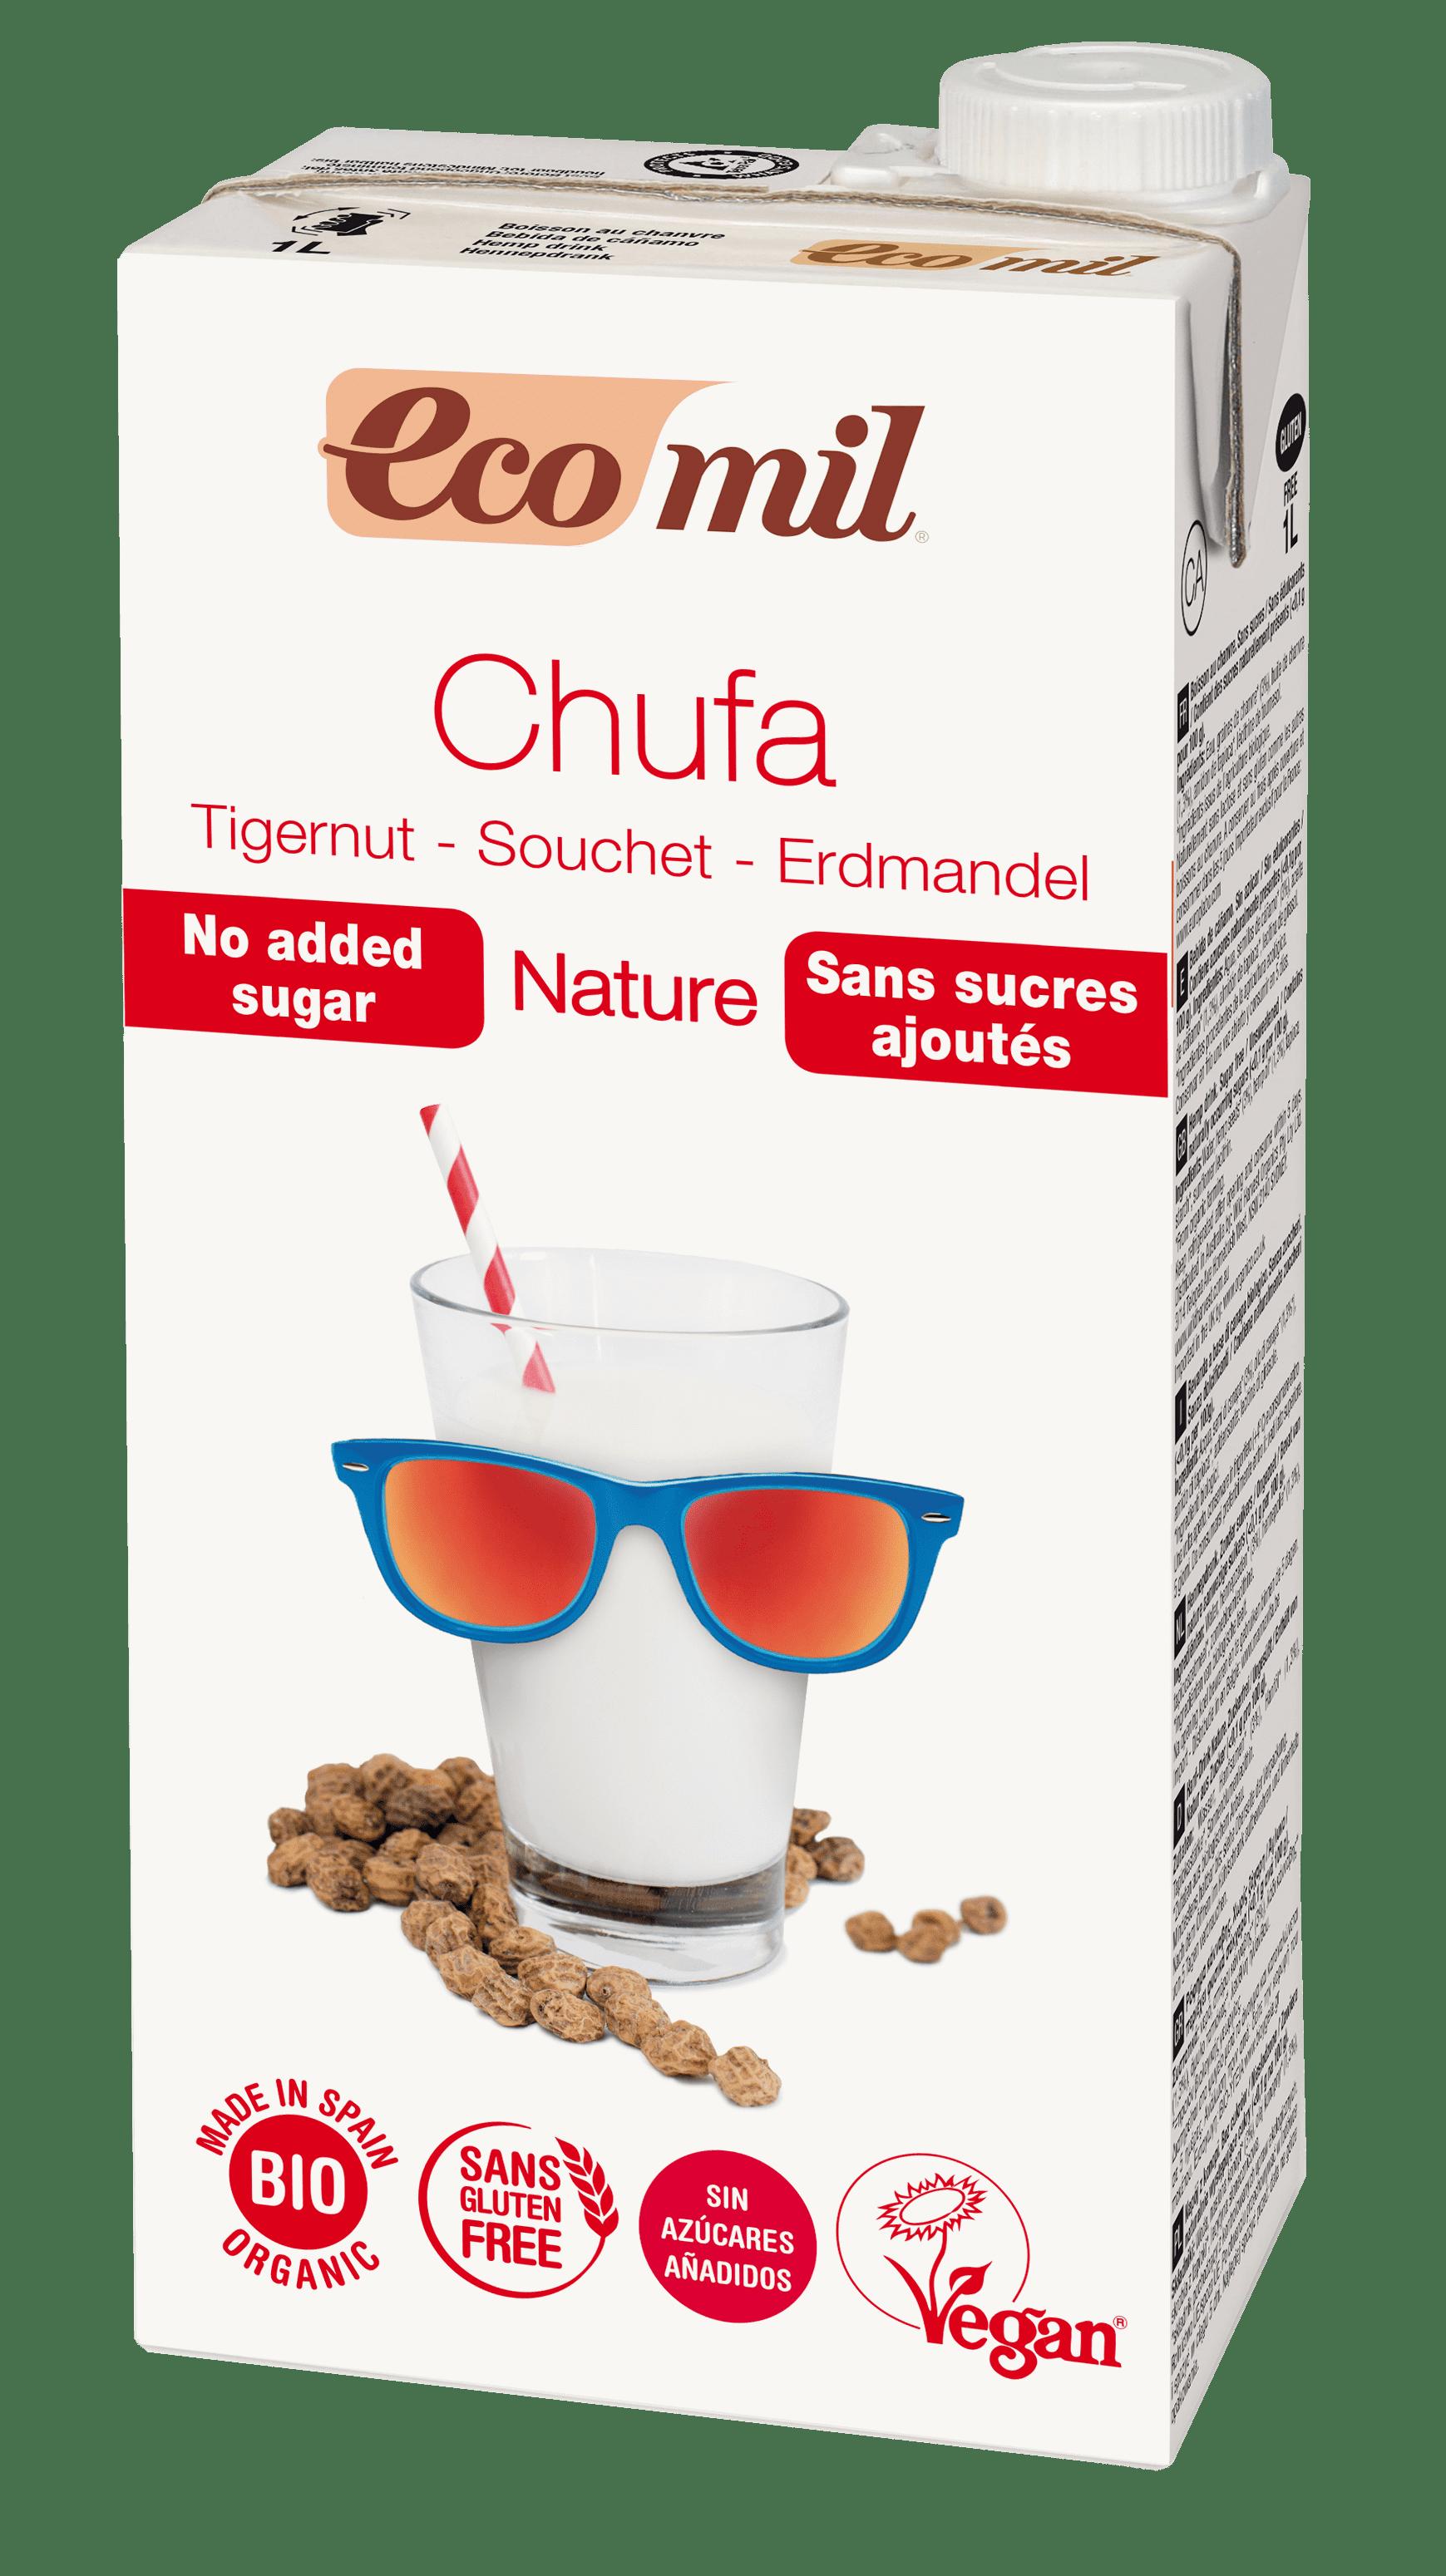 Органічне рослинне молоко з земляного горіху (Чуфа) без додавання цукру, 1л - купить в интернет-магазине Юнимед